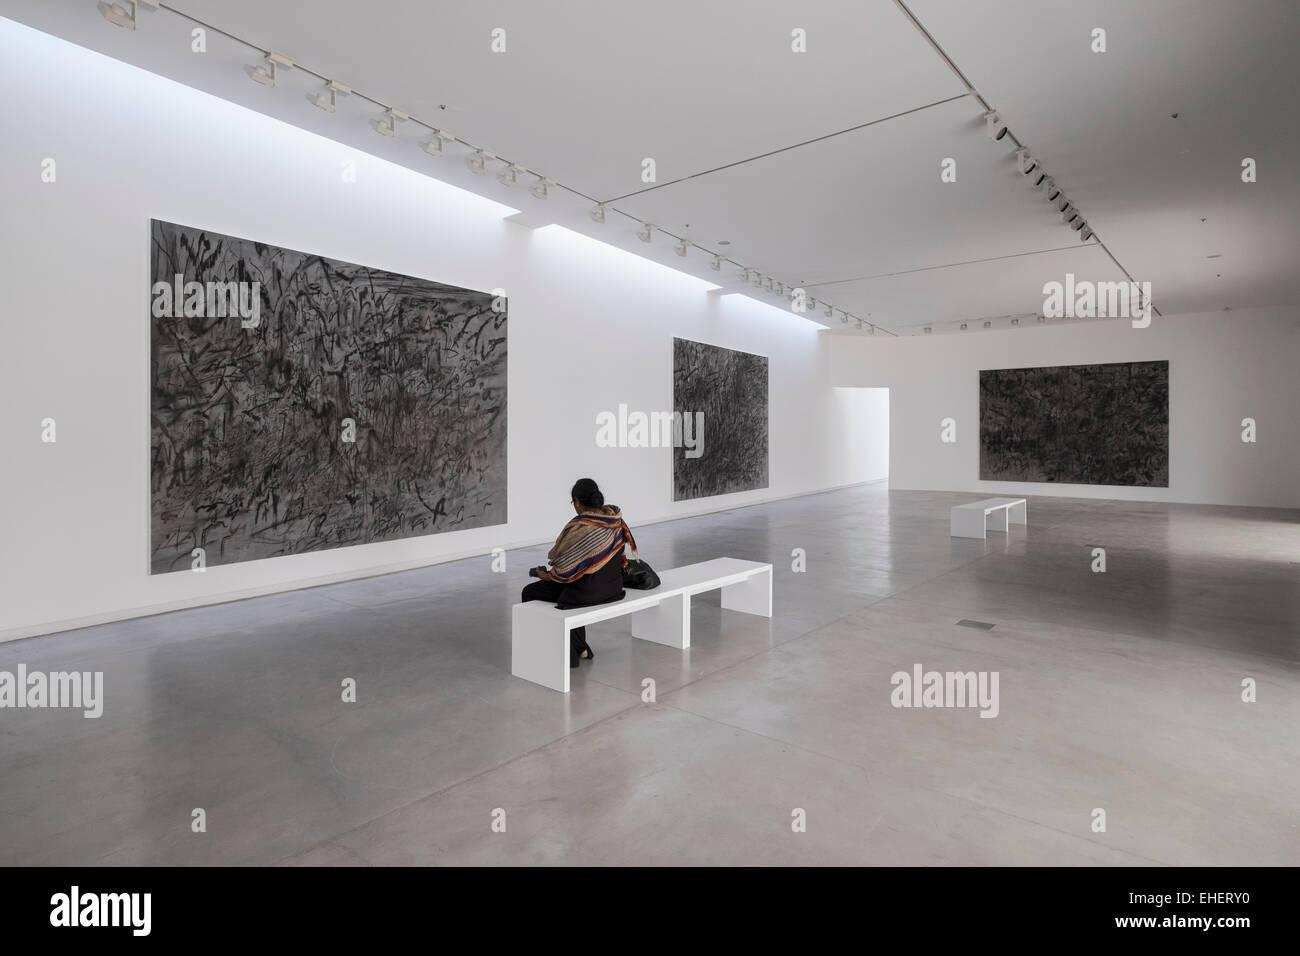 art installations by Julie Mehretu at 2015 Sharjah Biennial art festival in Sharjah United Arab Emirates - Stock Image